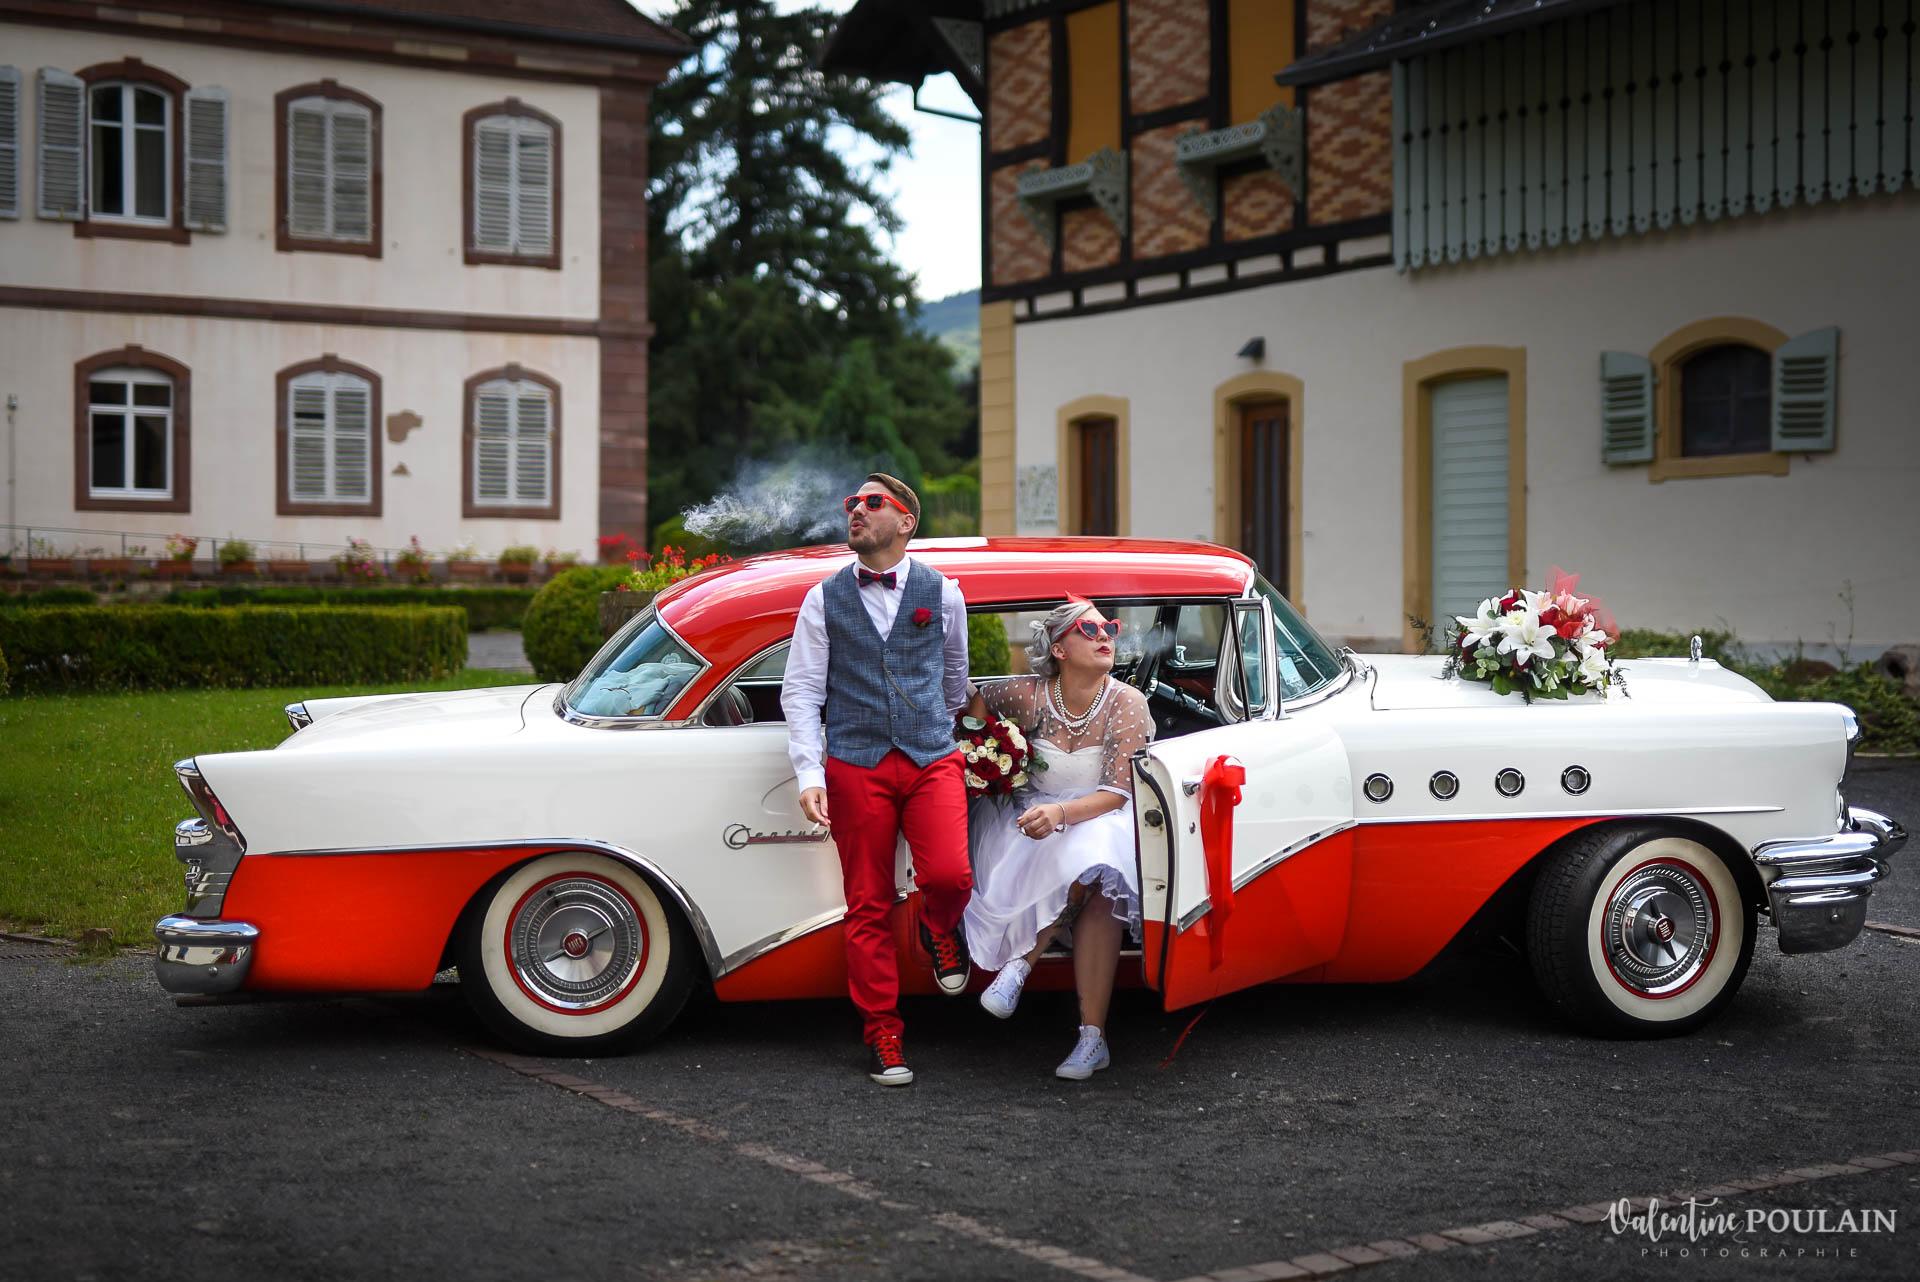 Mariage vintage rockabilly - Valentine Poulain voiture rouge